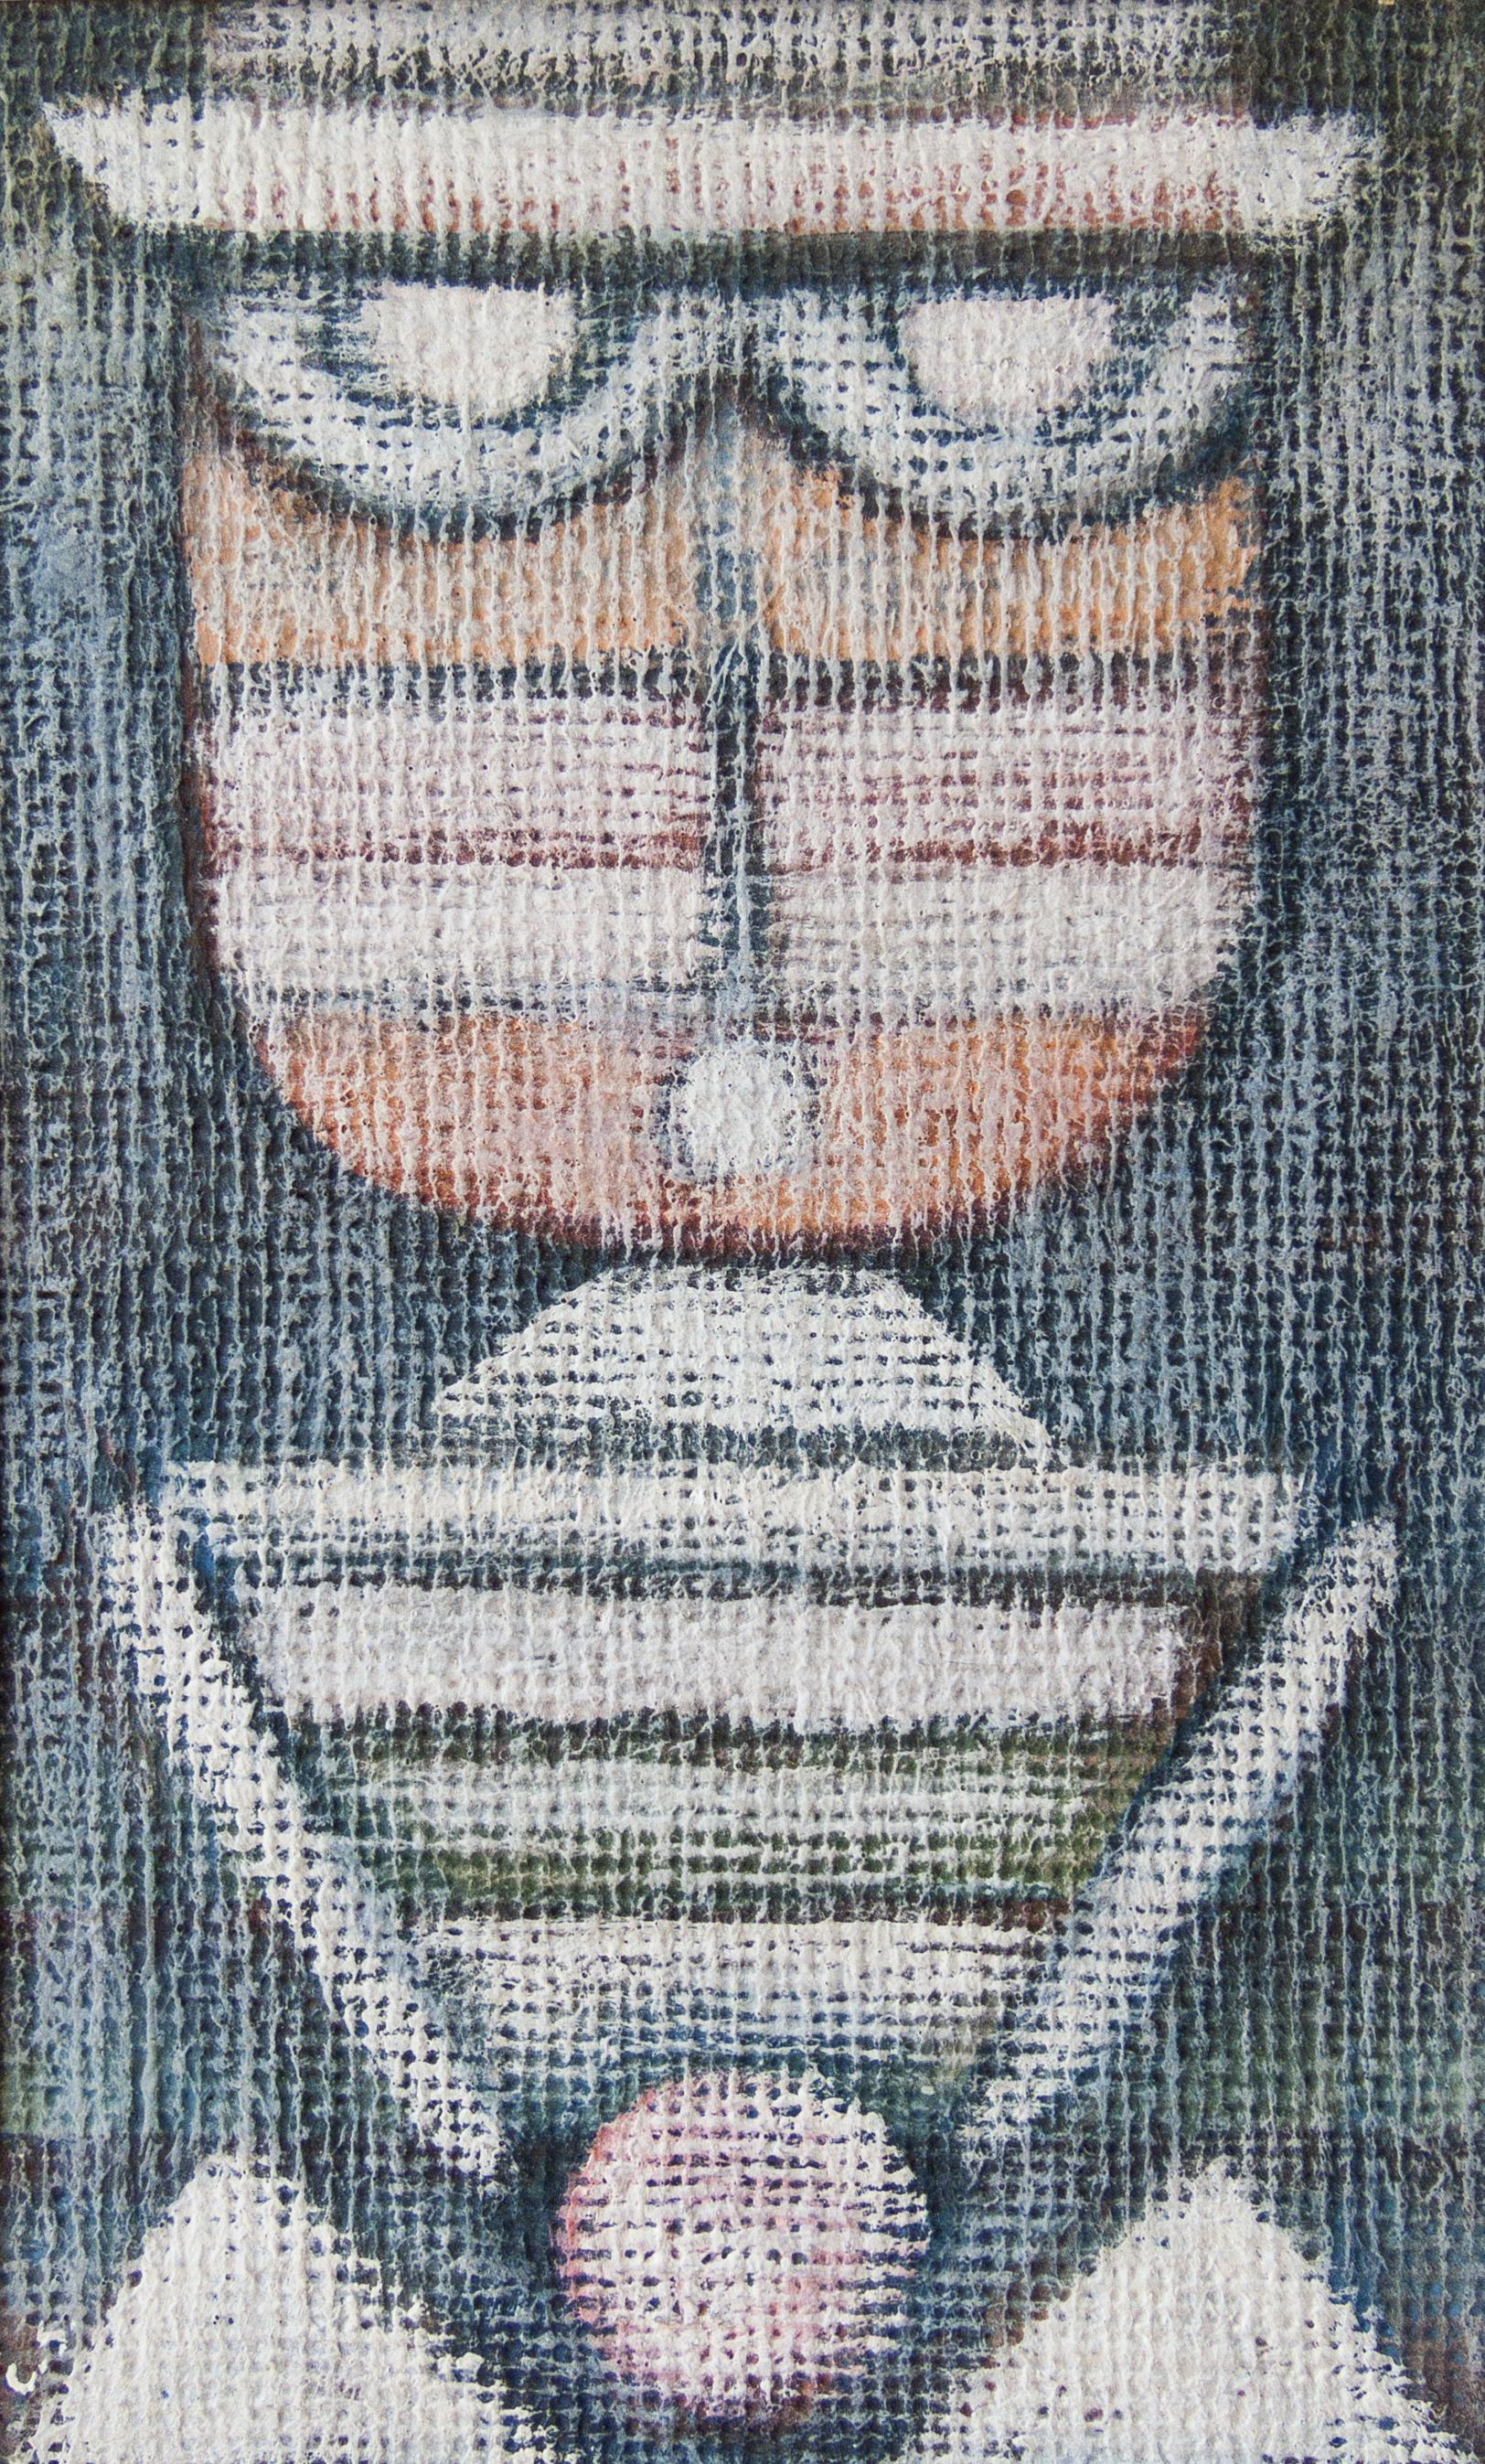 Untitled (Masked Figure)